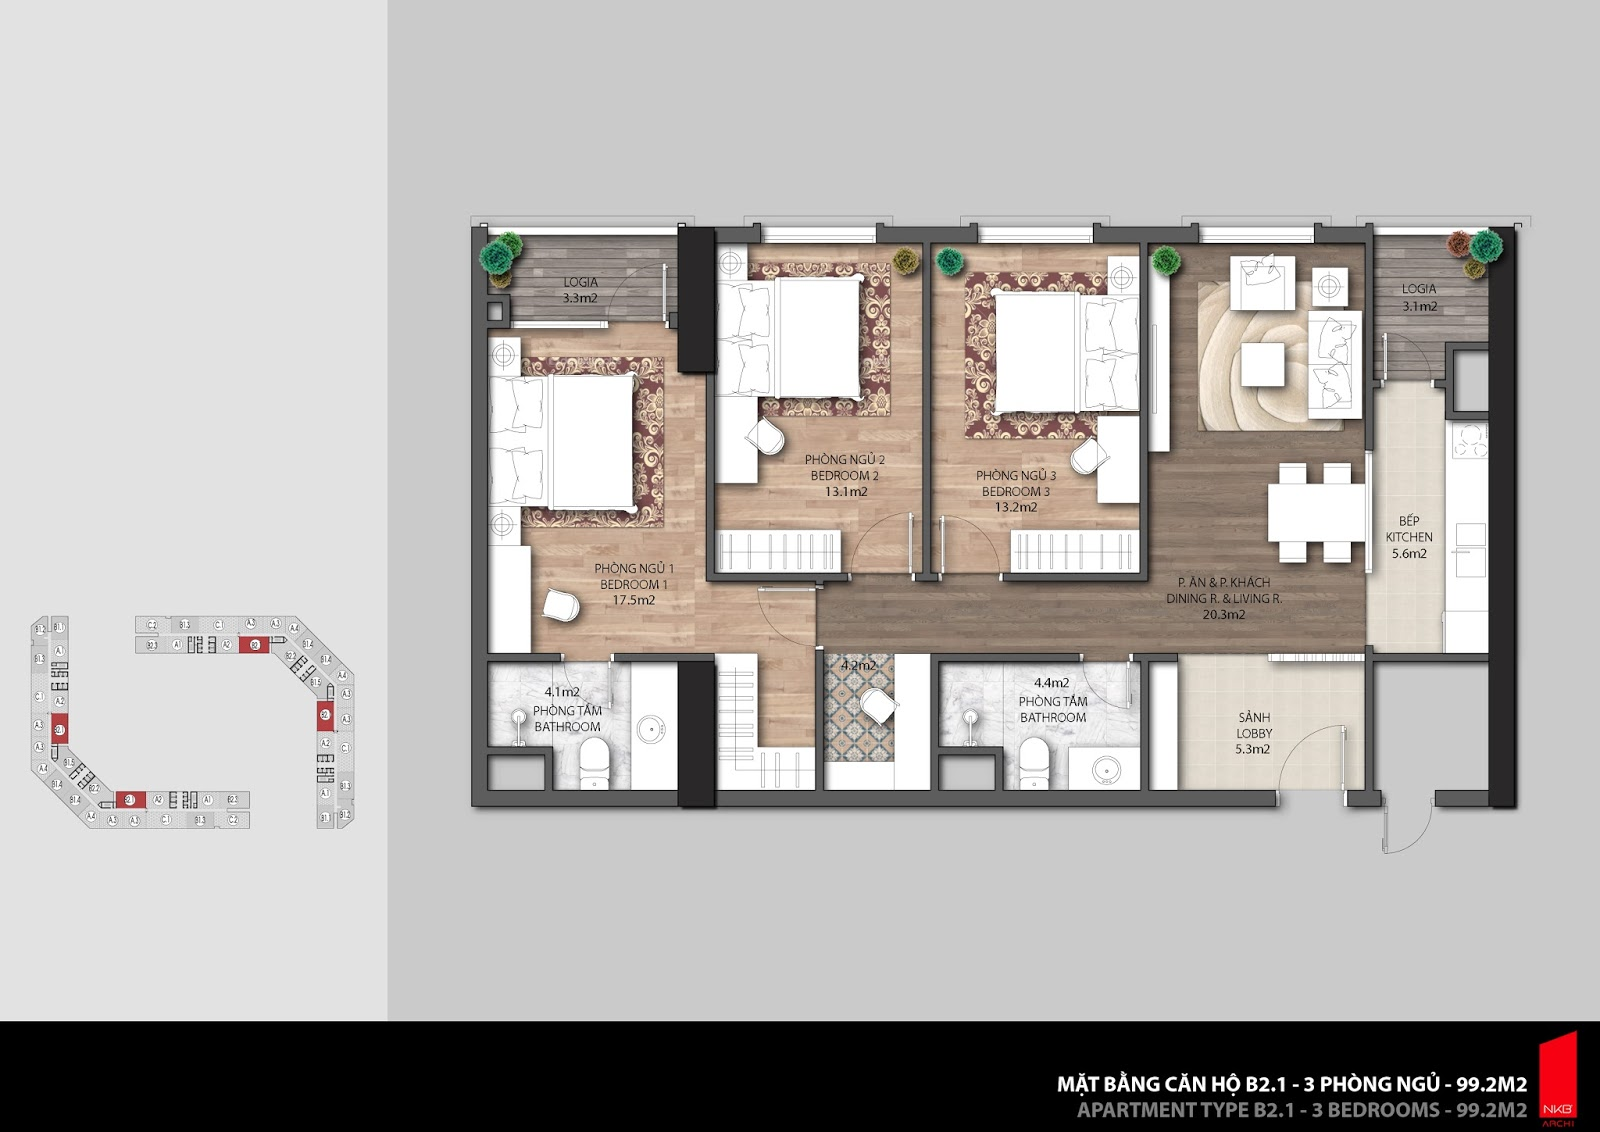 Mặt bằng căn hộ 99,2m2